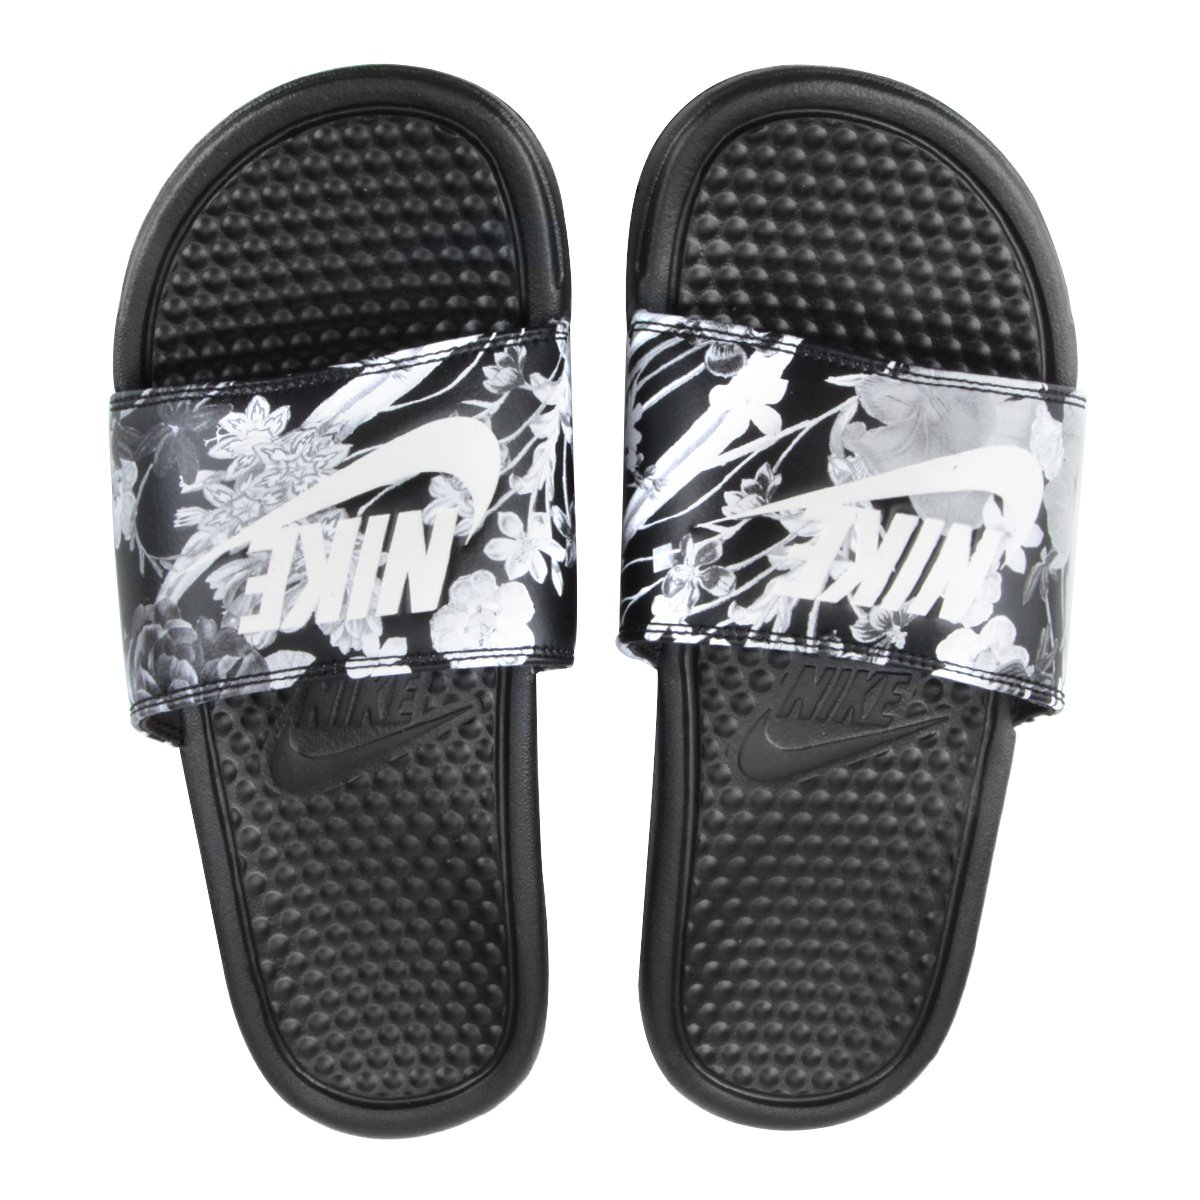 Preto Benassi E Cinza Print Nike Sandália Feminina Jdi PiTuwOkZX